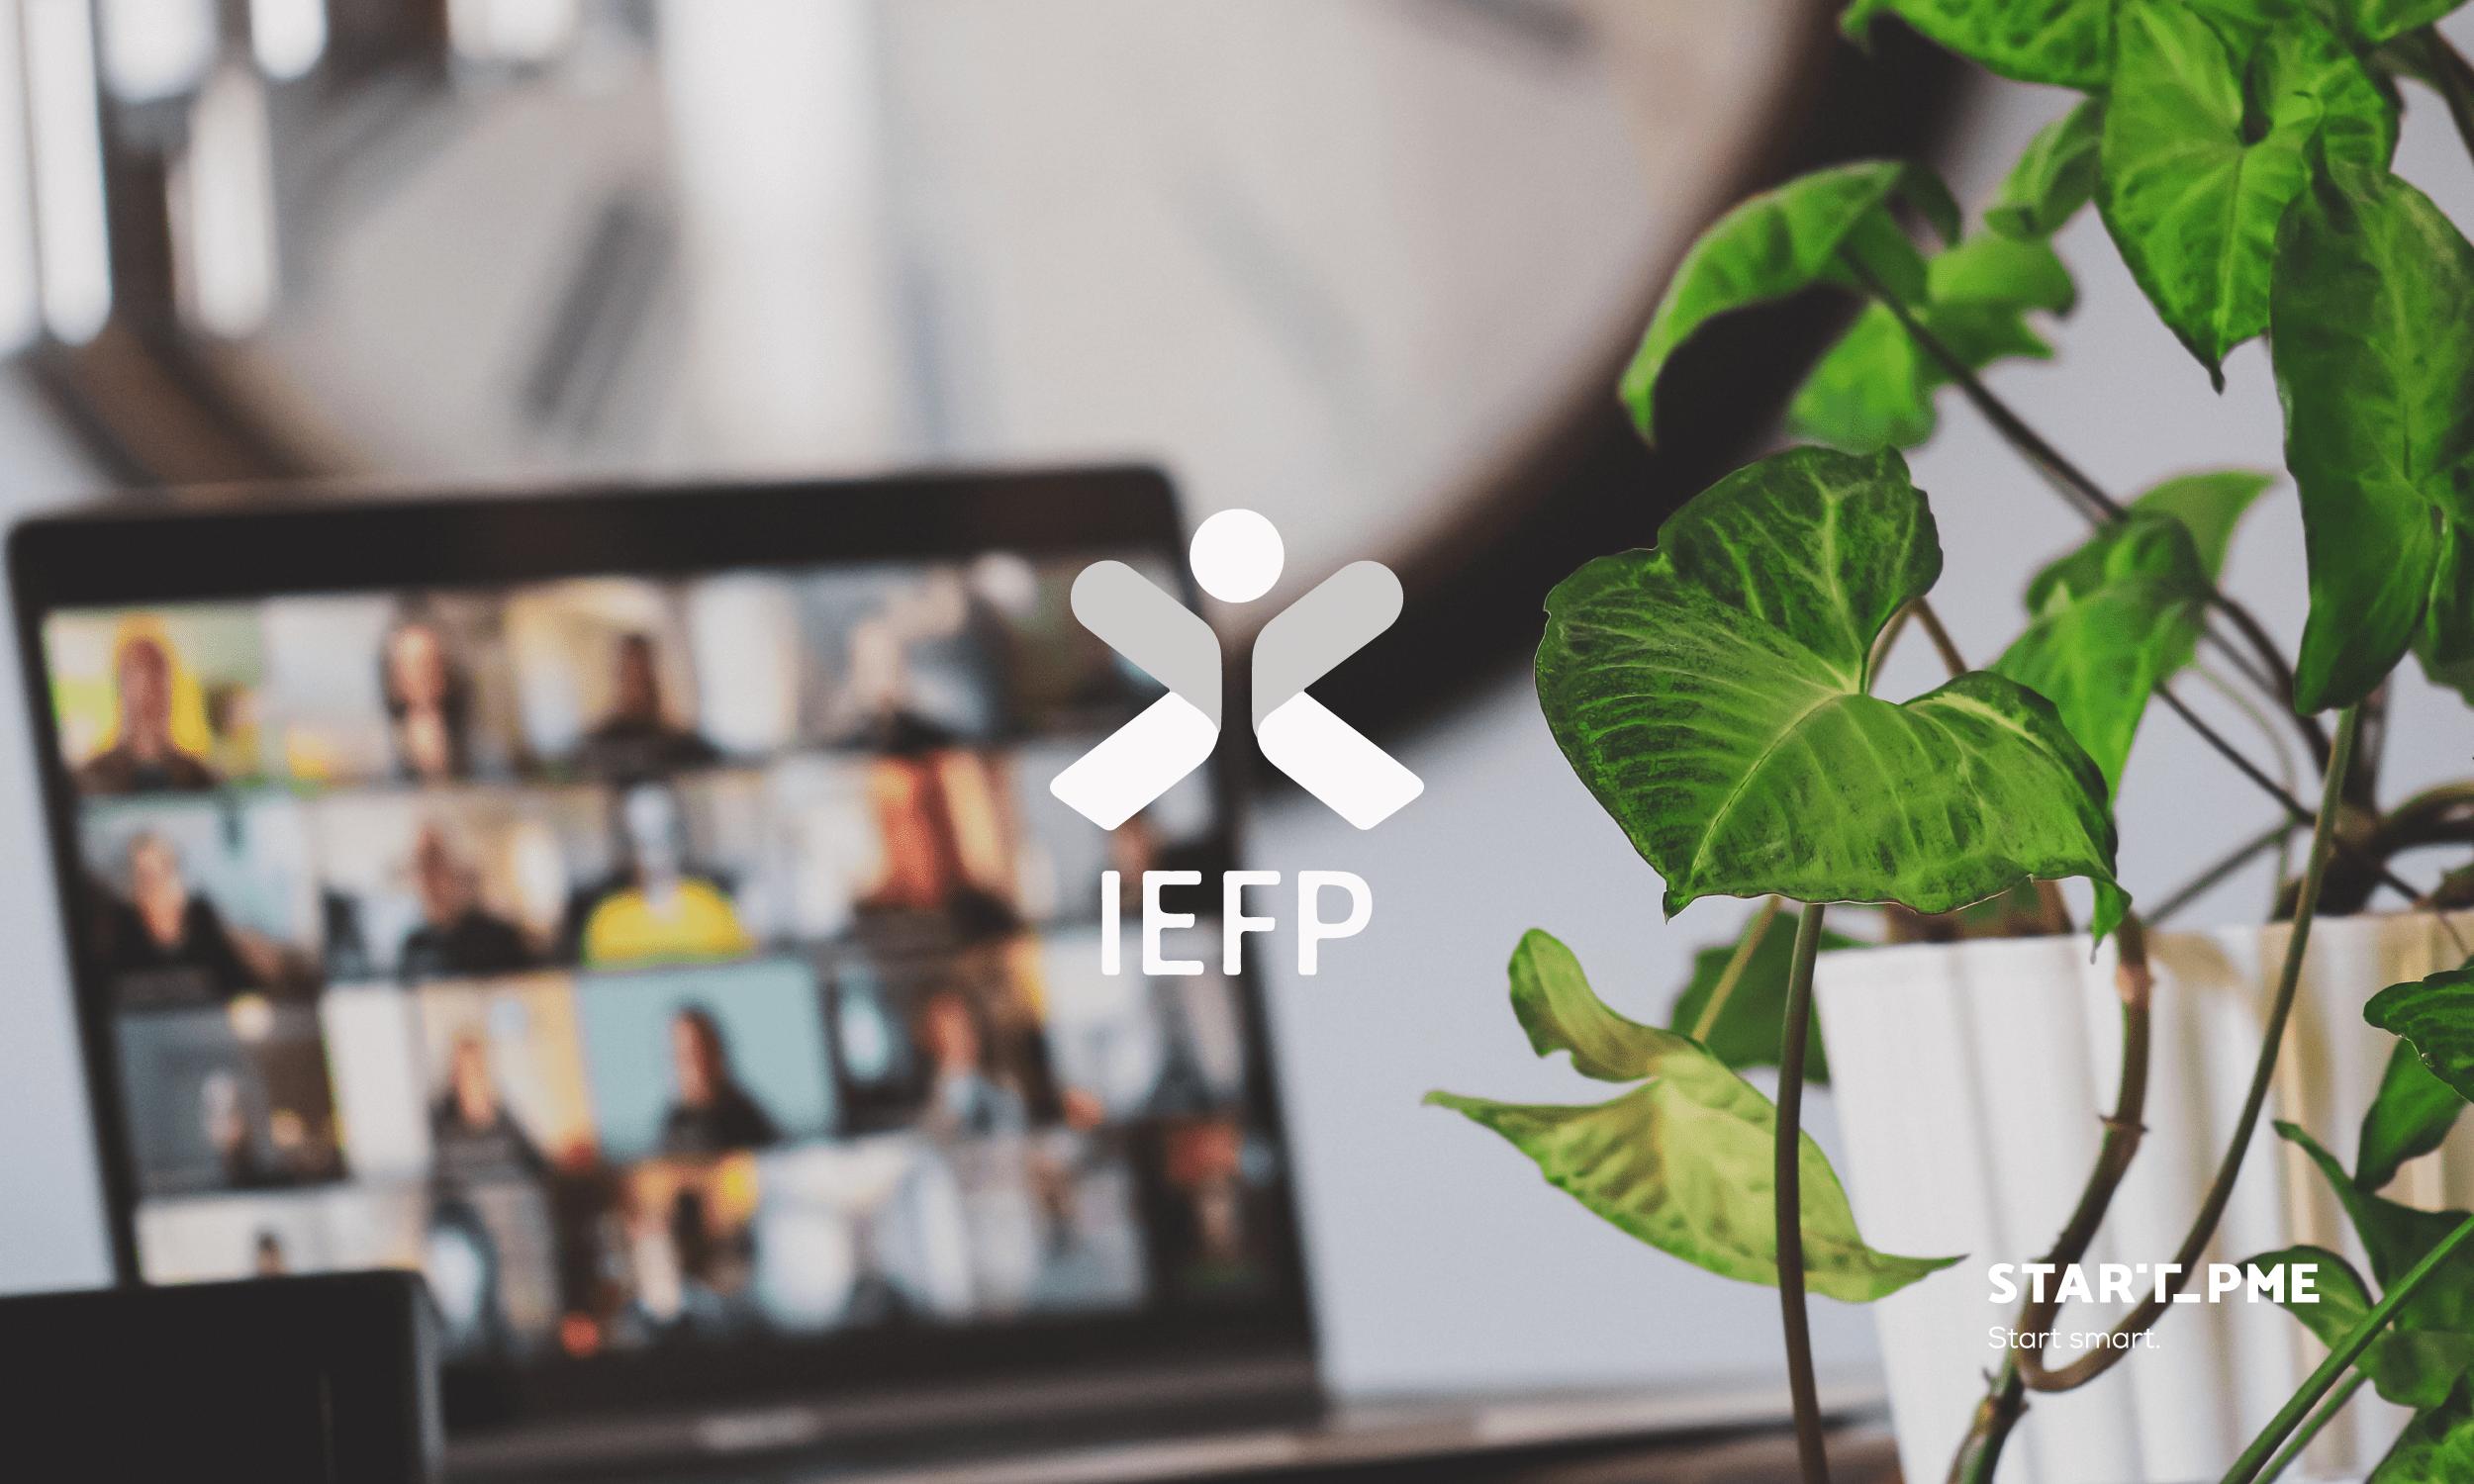 Start_PME-03setembro-IEFP